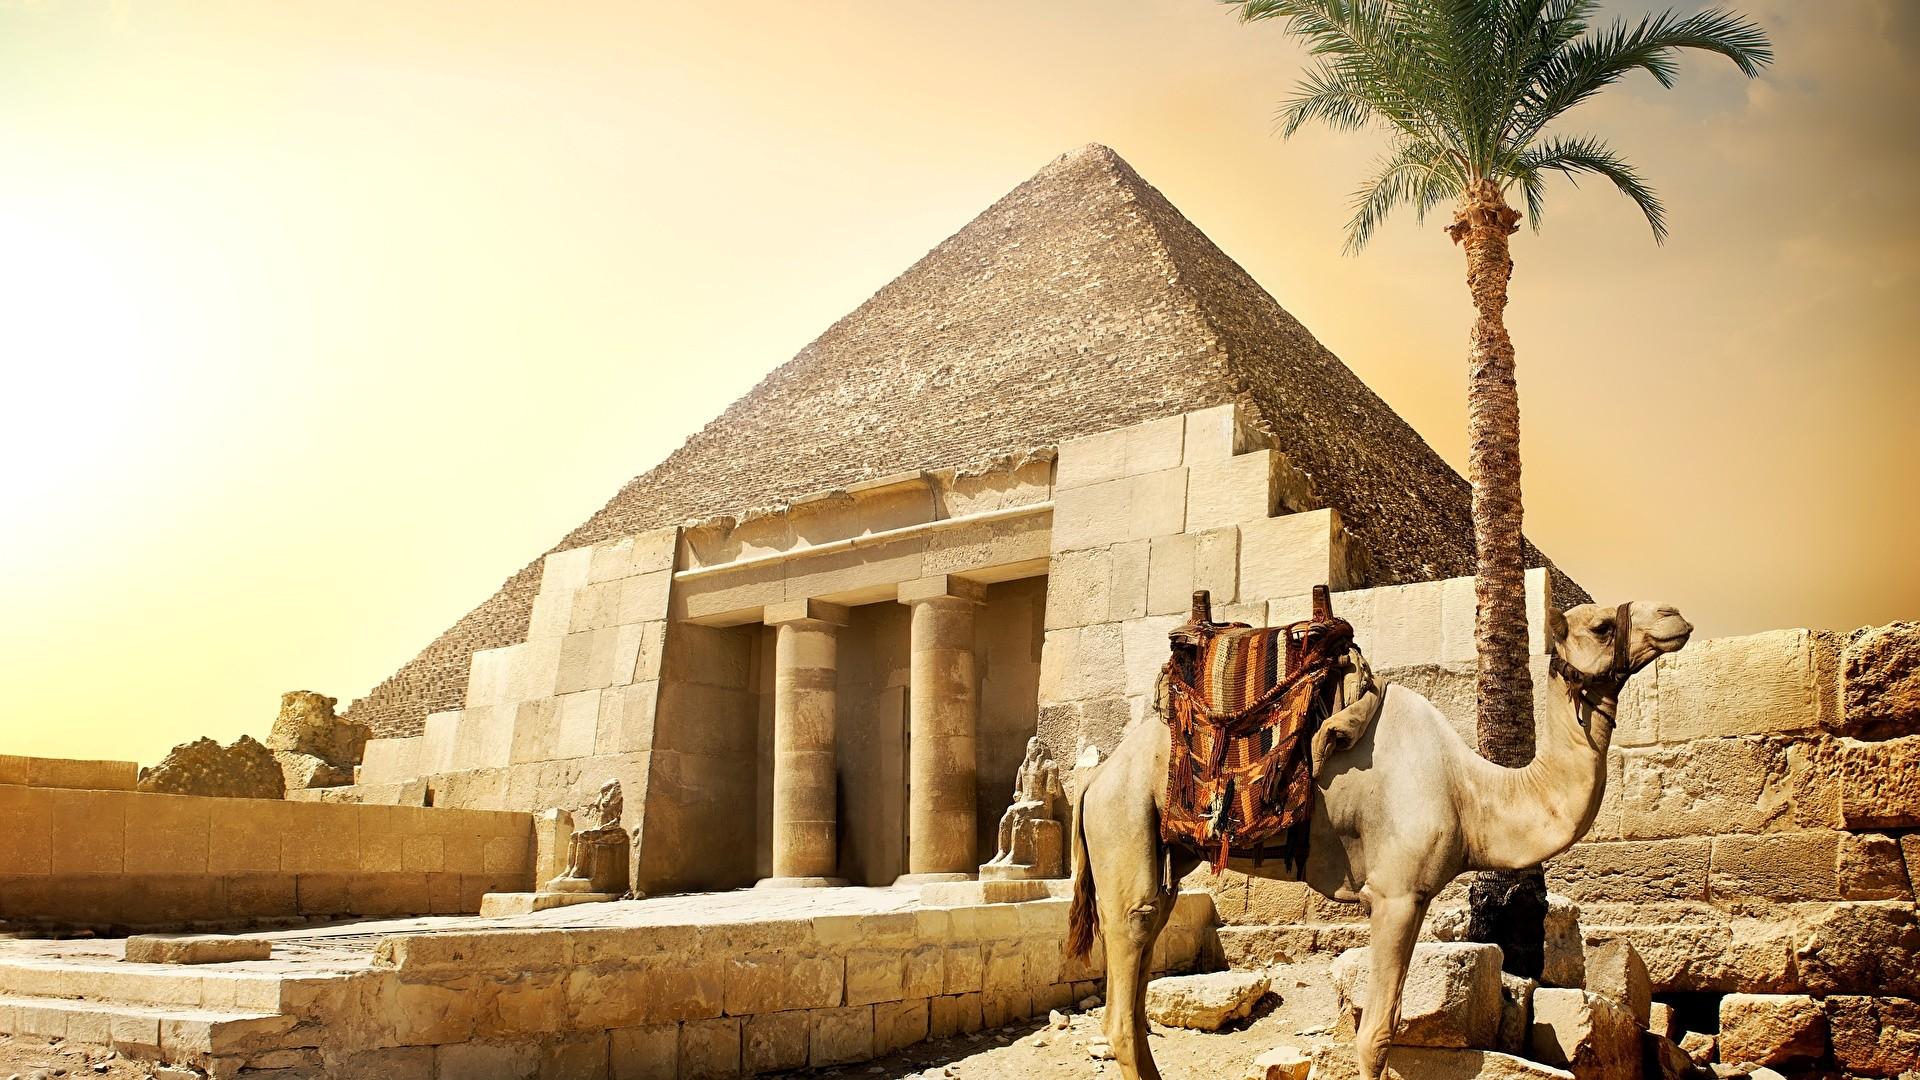 Egypt hd wallpaper download